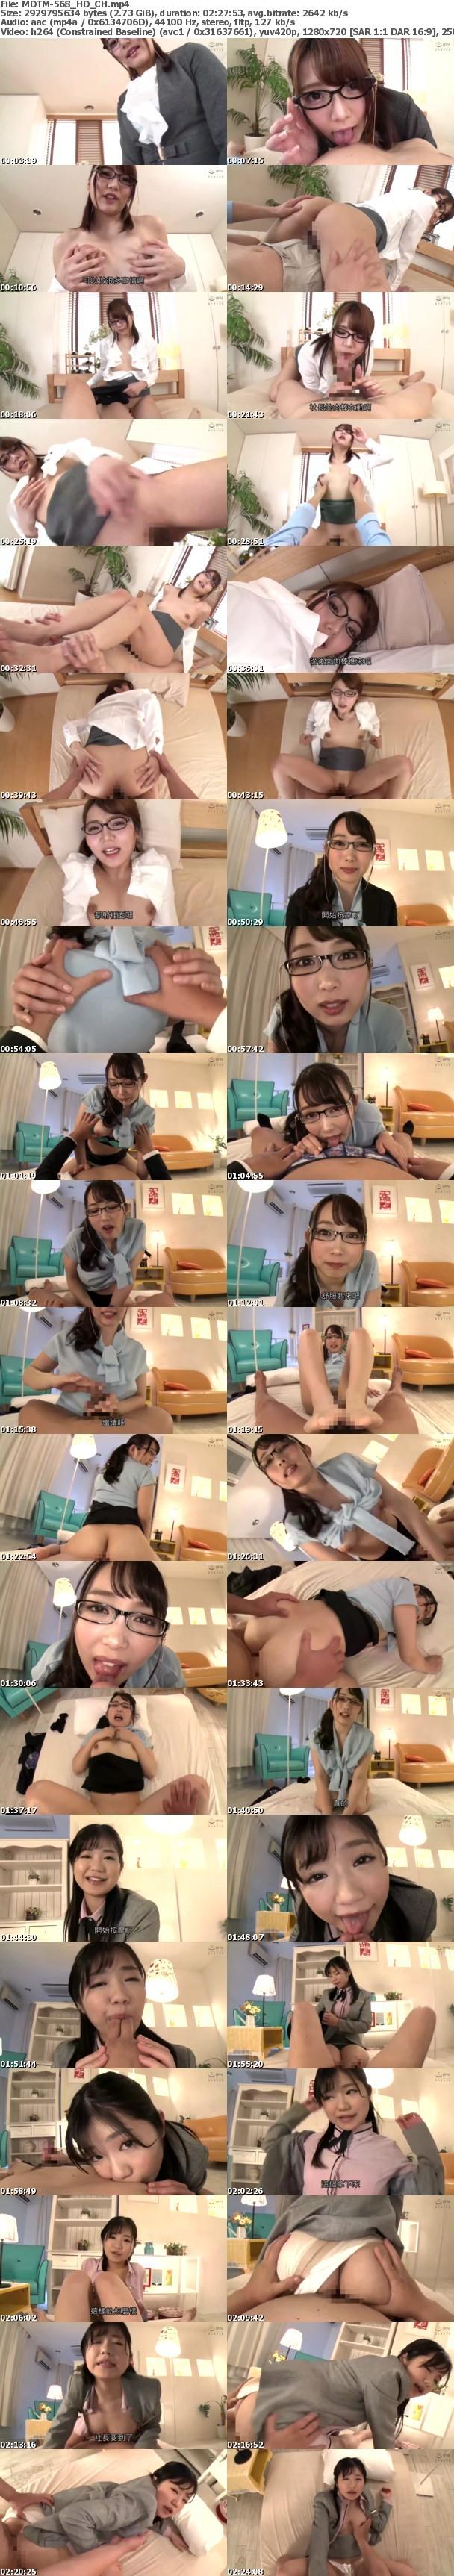 (HD) MDTM-568 銀河級美少女在籍!社長秘書情境俱樂部PREMIUM Vol.001[有碼高清中文字幕]